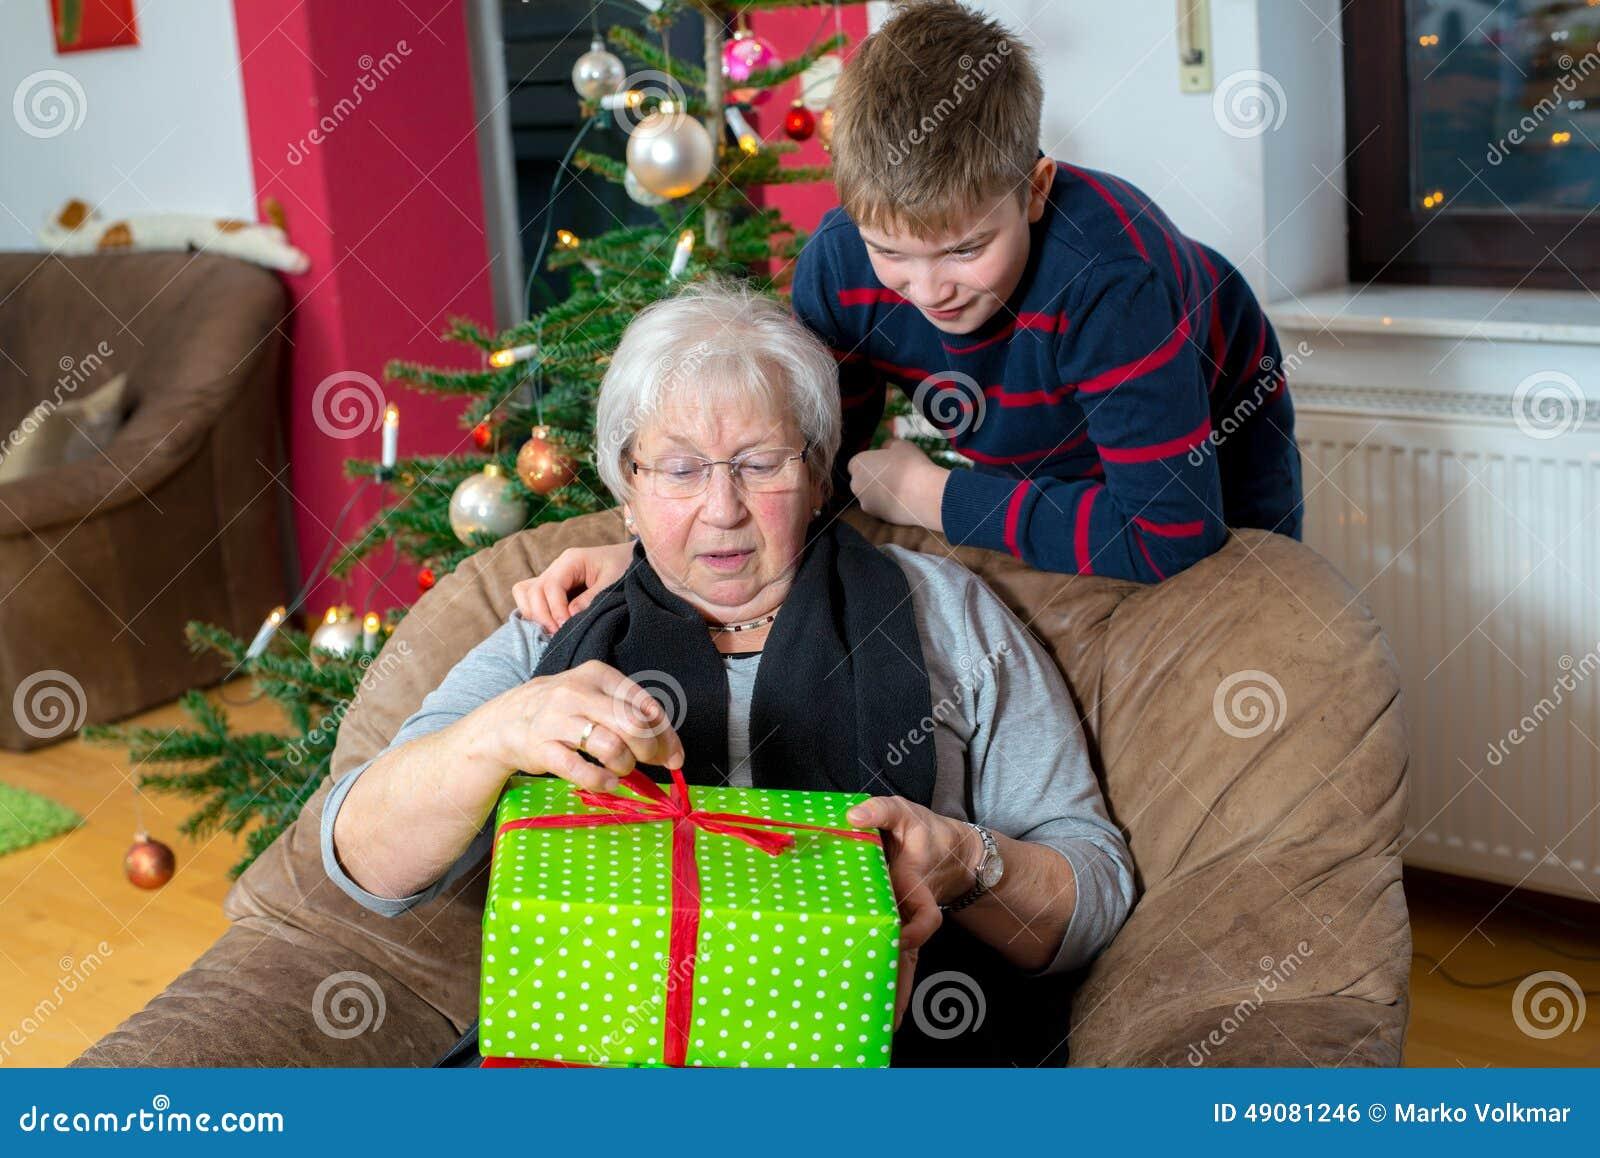 Le gar on a un cadeau de no l pour sa grand m re photo stock image 49081246 - Idee cadeau noel grand mere ...